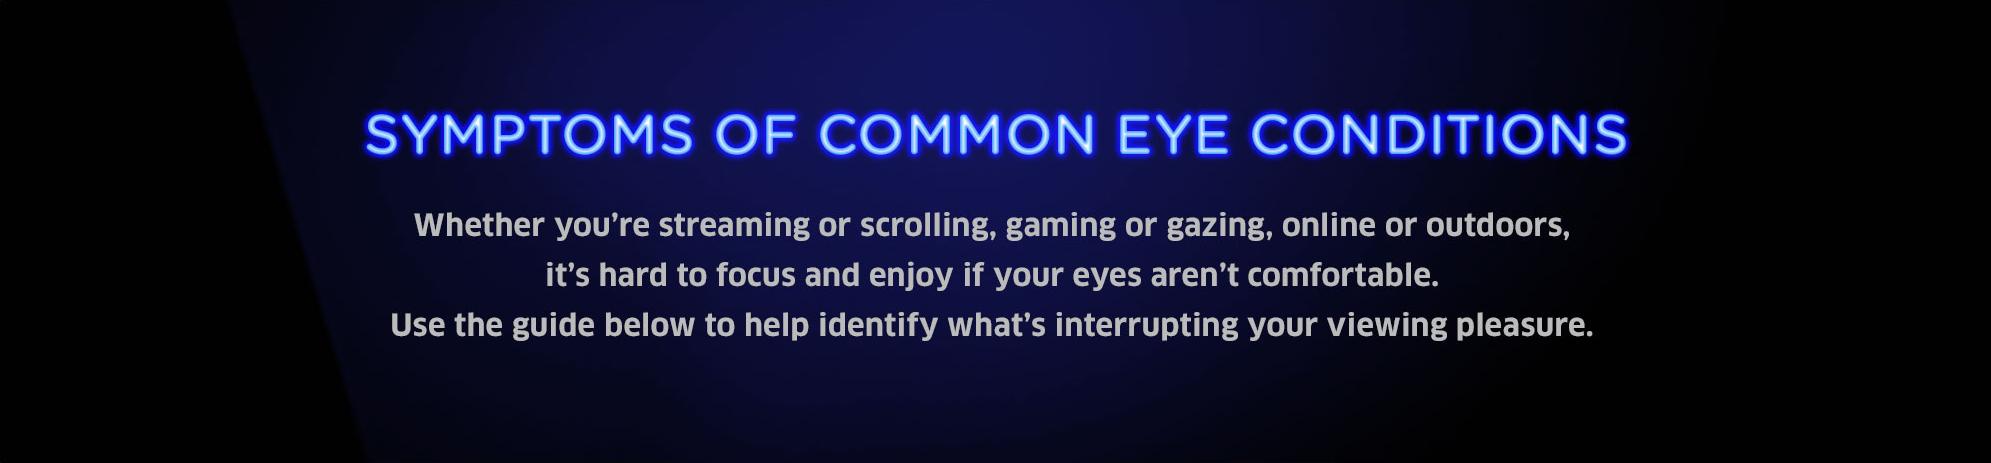 Symptoms Of Common Eye Problems